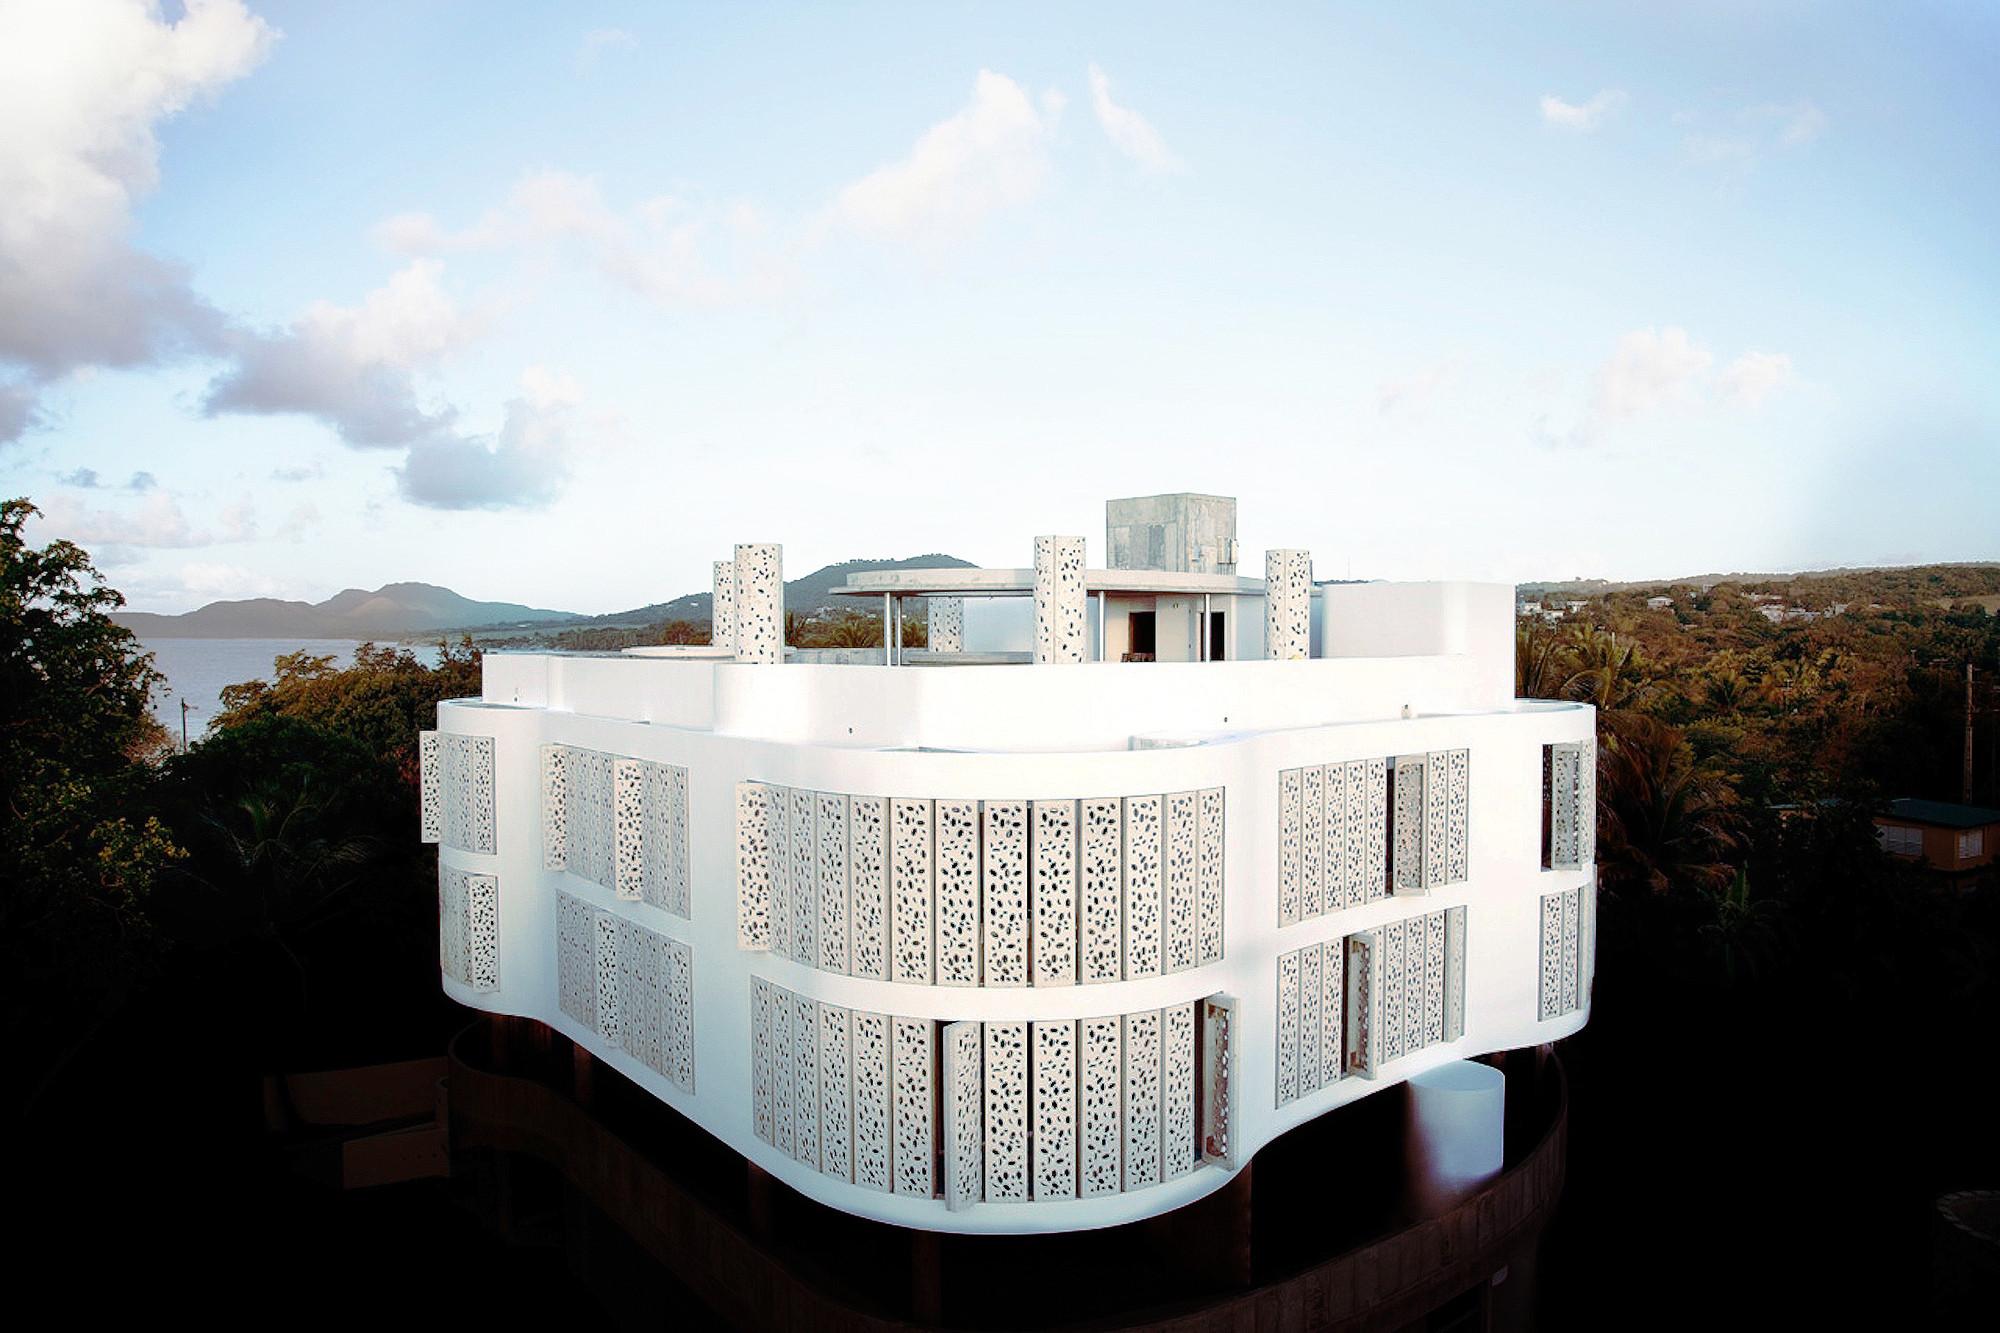 El Blok / FUSTER +  Architects, © Dianne Puliza